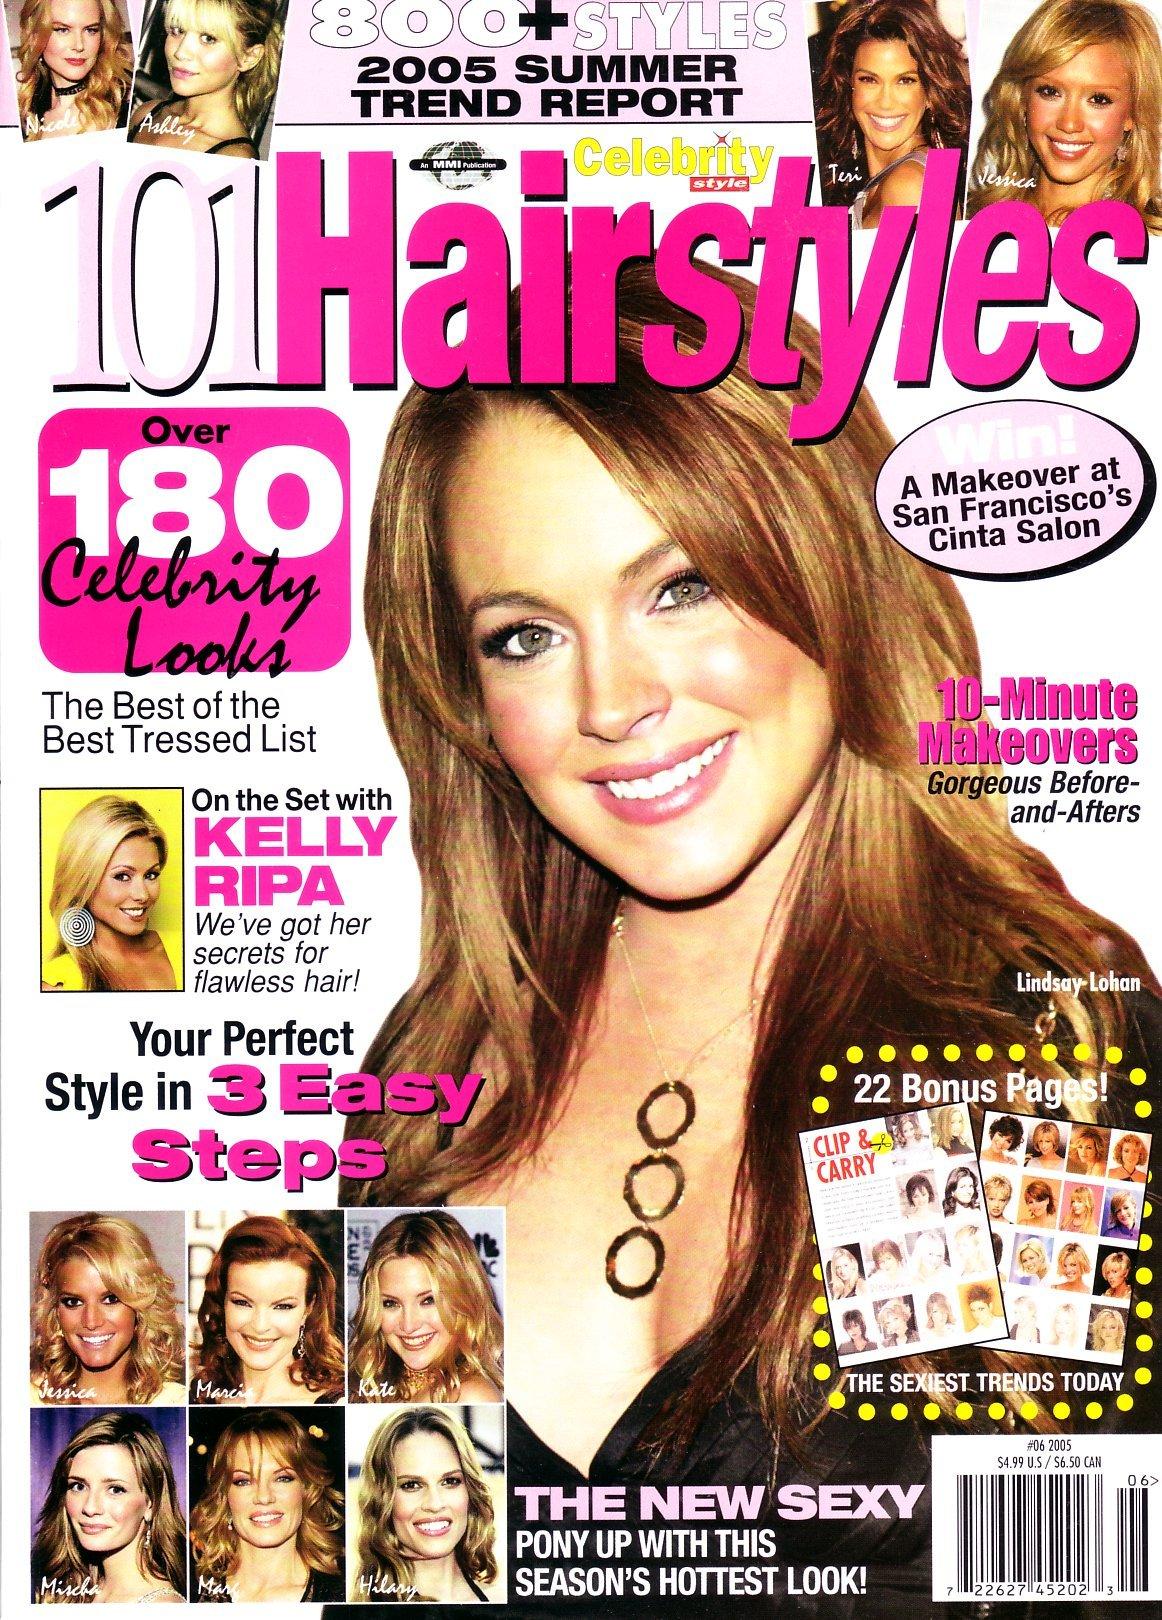 101 Hairstyles 06 2005 Lindsay Lohan Karen Marie Shelton Cheryl Crosby Cheryl Crosby 0632687706991 Amazon Com Books